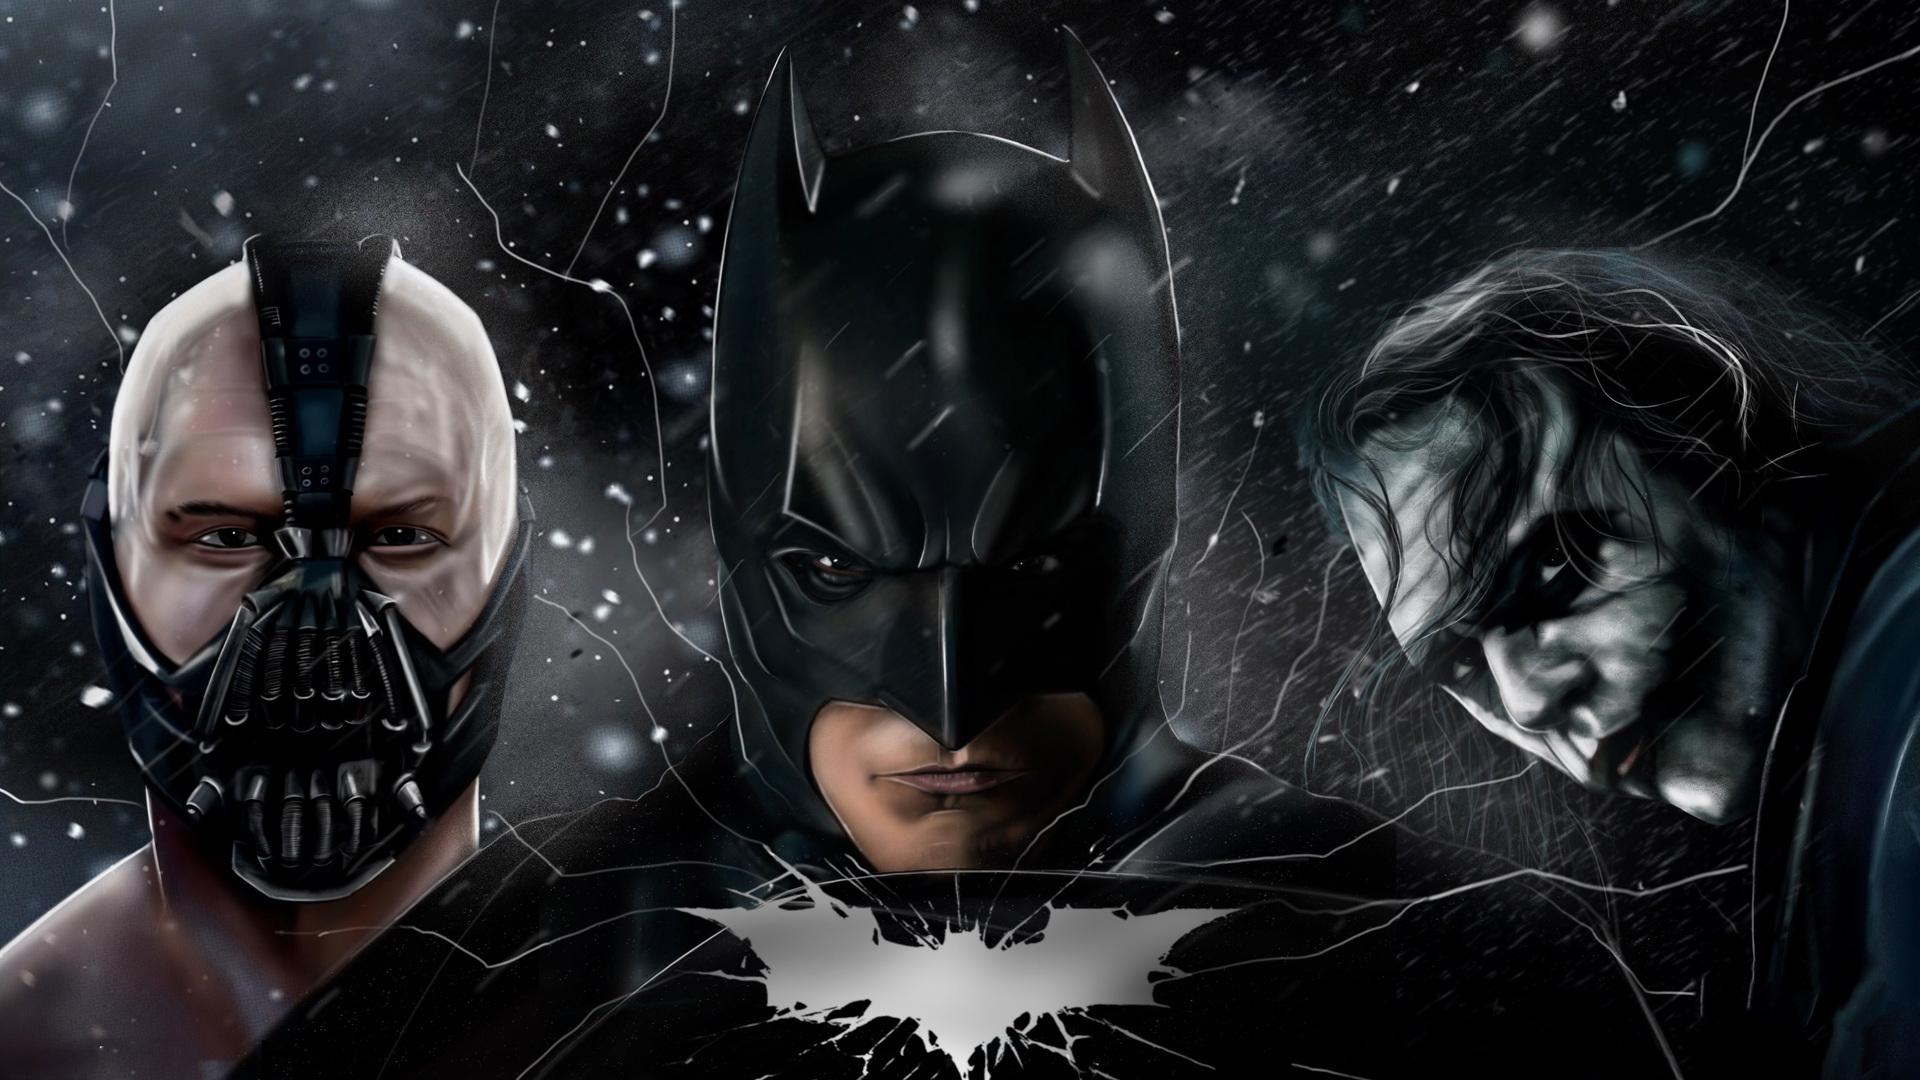 The Dark Knight Batman Joker Bane 5k Batman The Dark Knight 4k